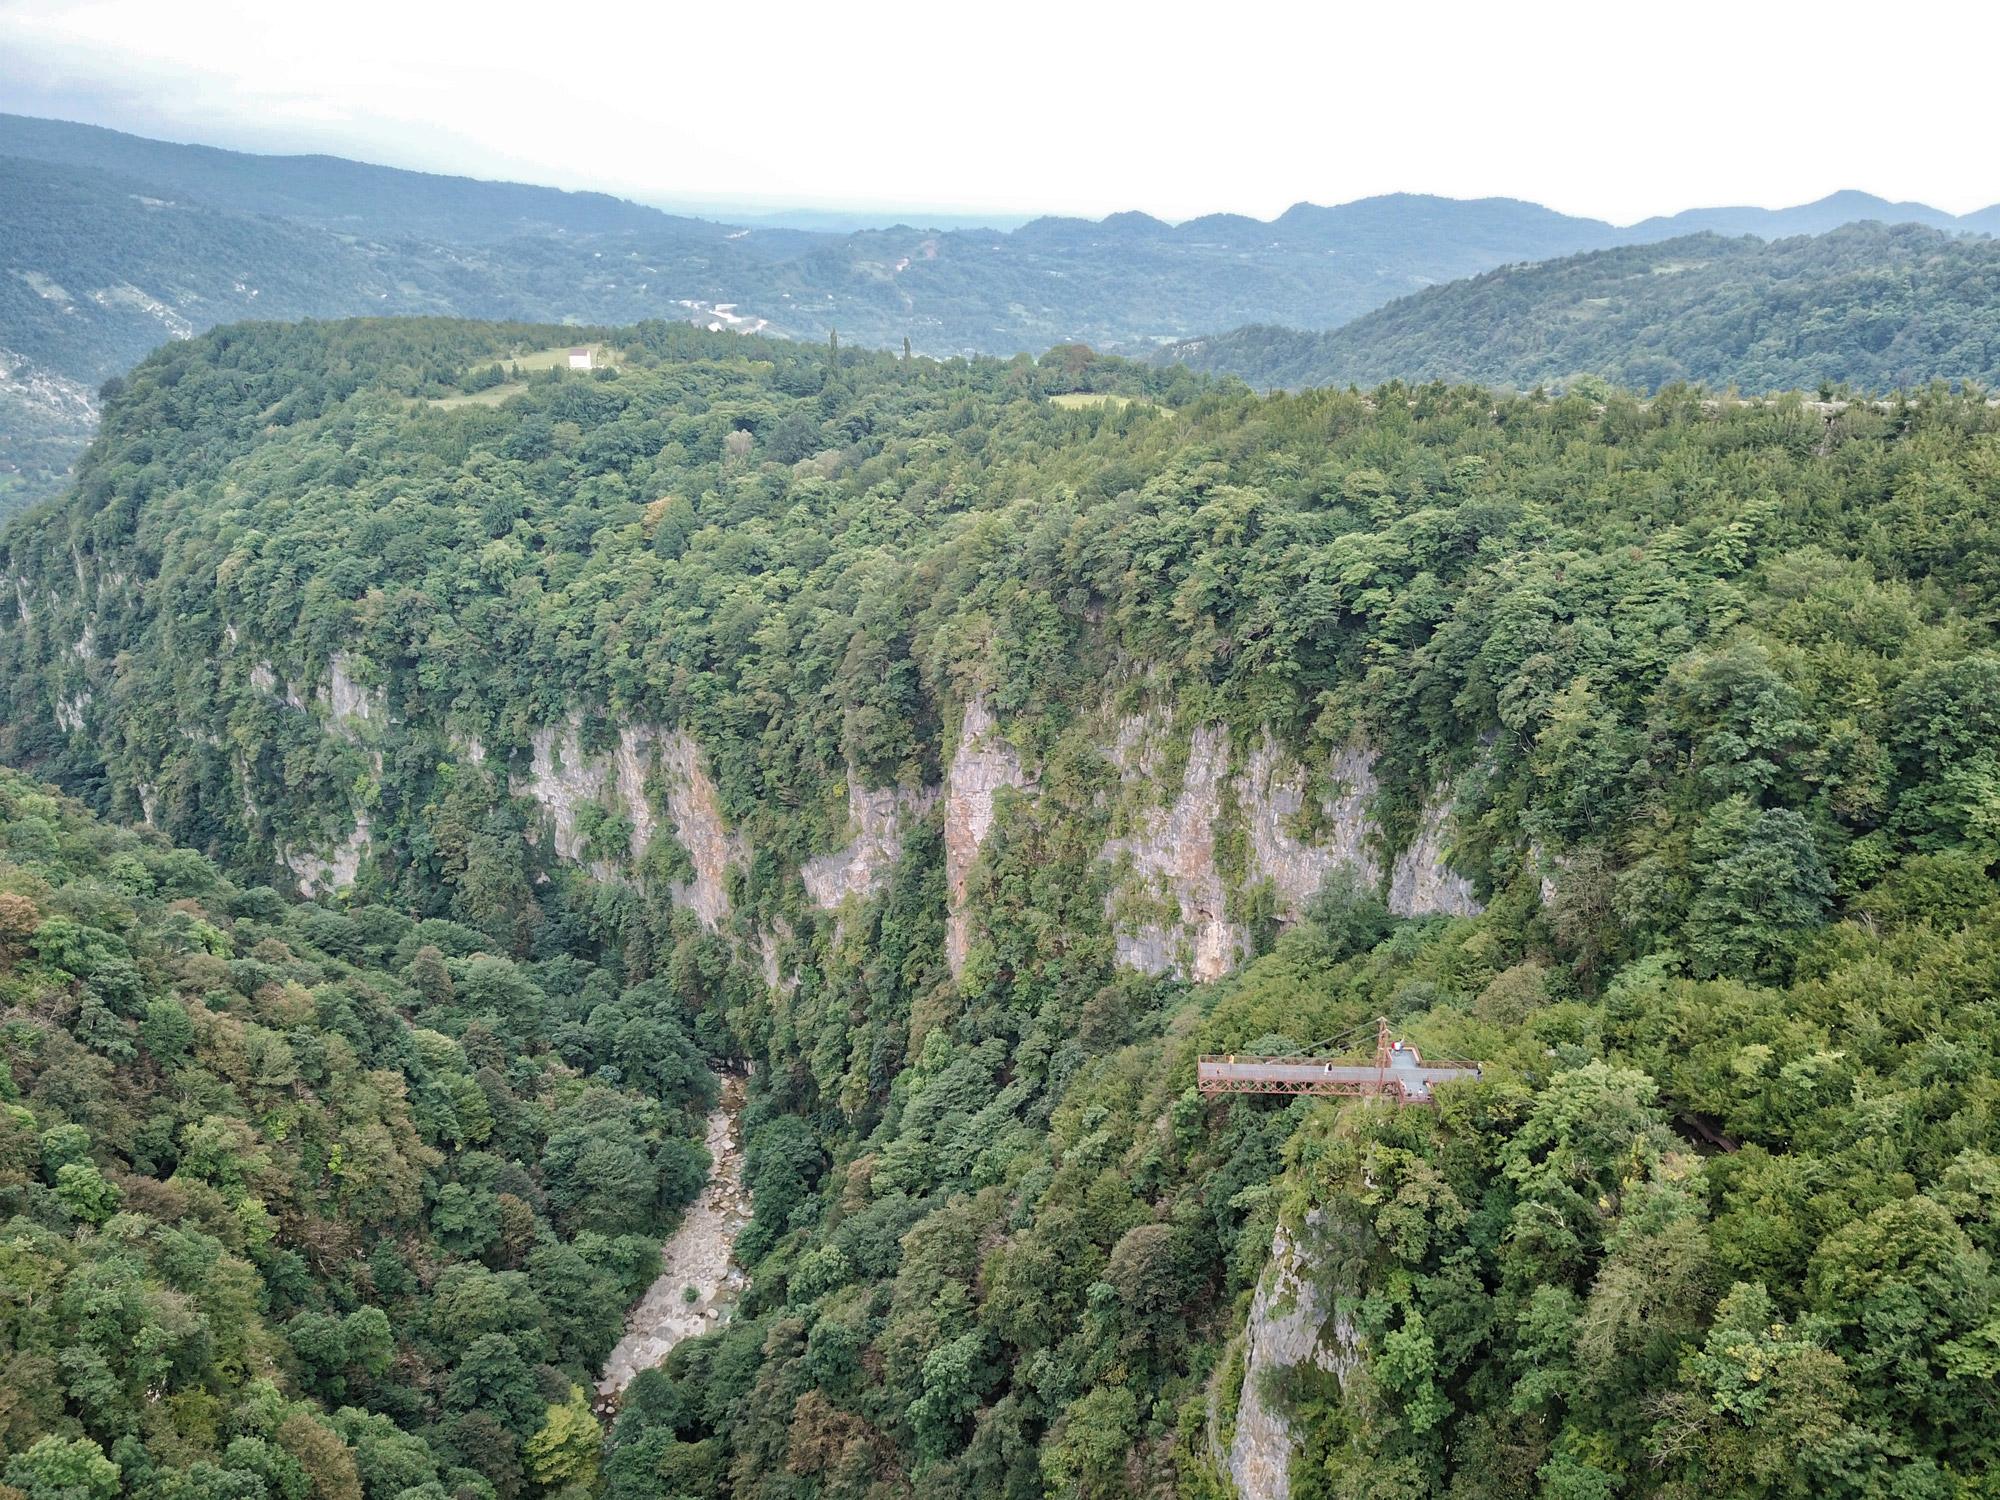 Georgië reisverslag: Okatse Canyon